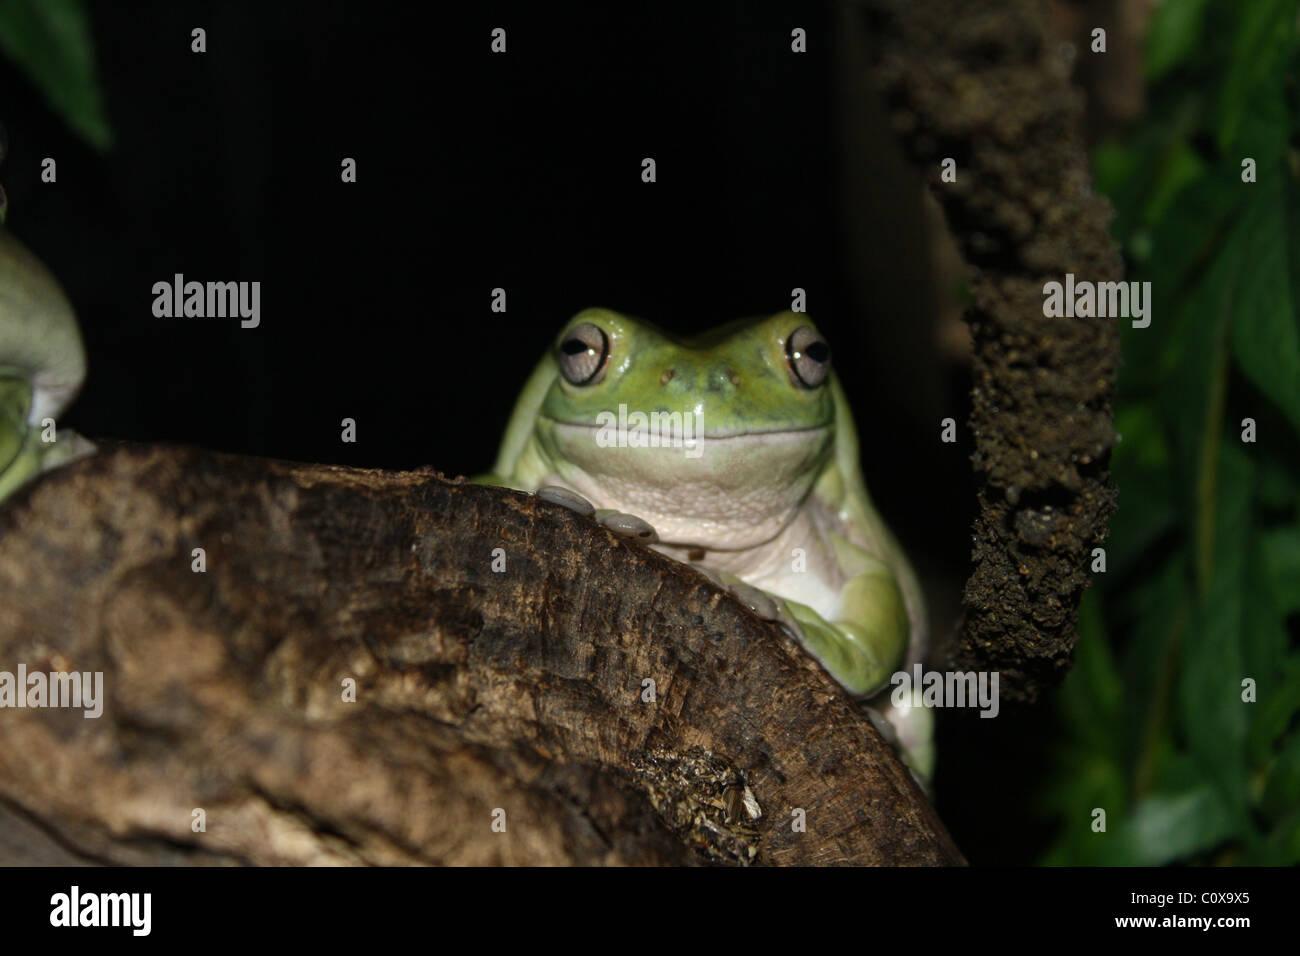 Bug eye green frog giving the camera a smile. :-) - Stock Image